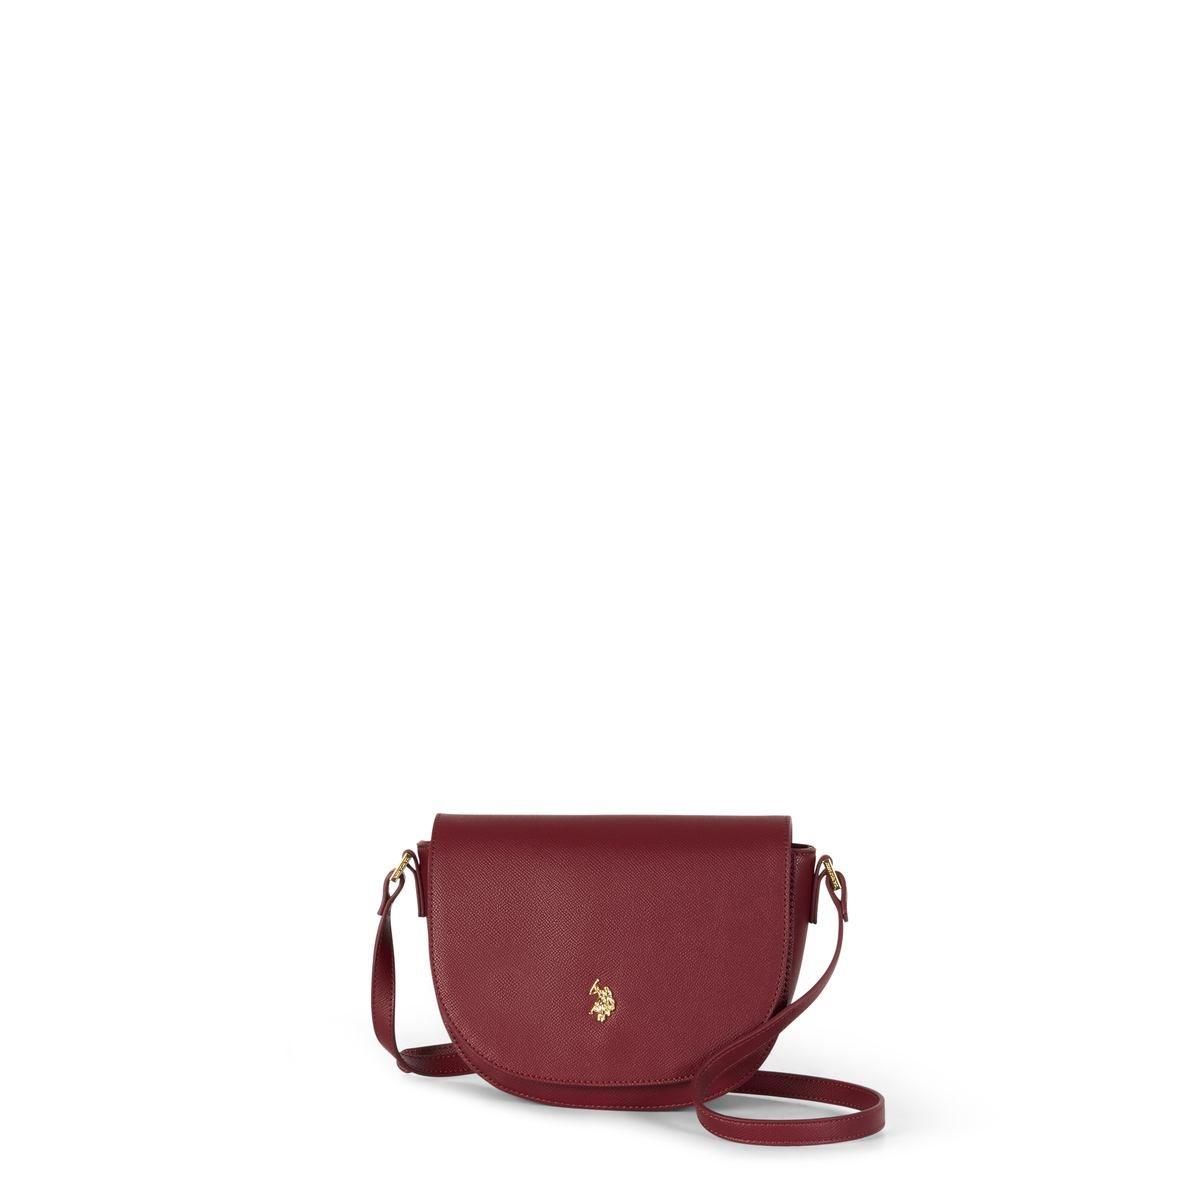 US Polo Assn. Τσάνται ώμου γυναικεία 21x7x12cm Jones Wine